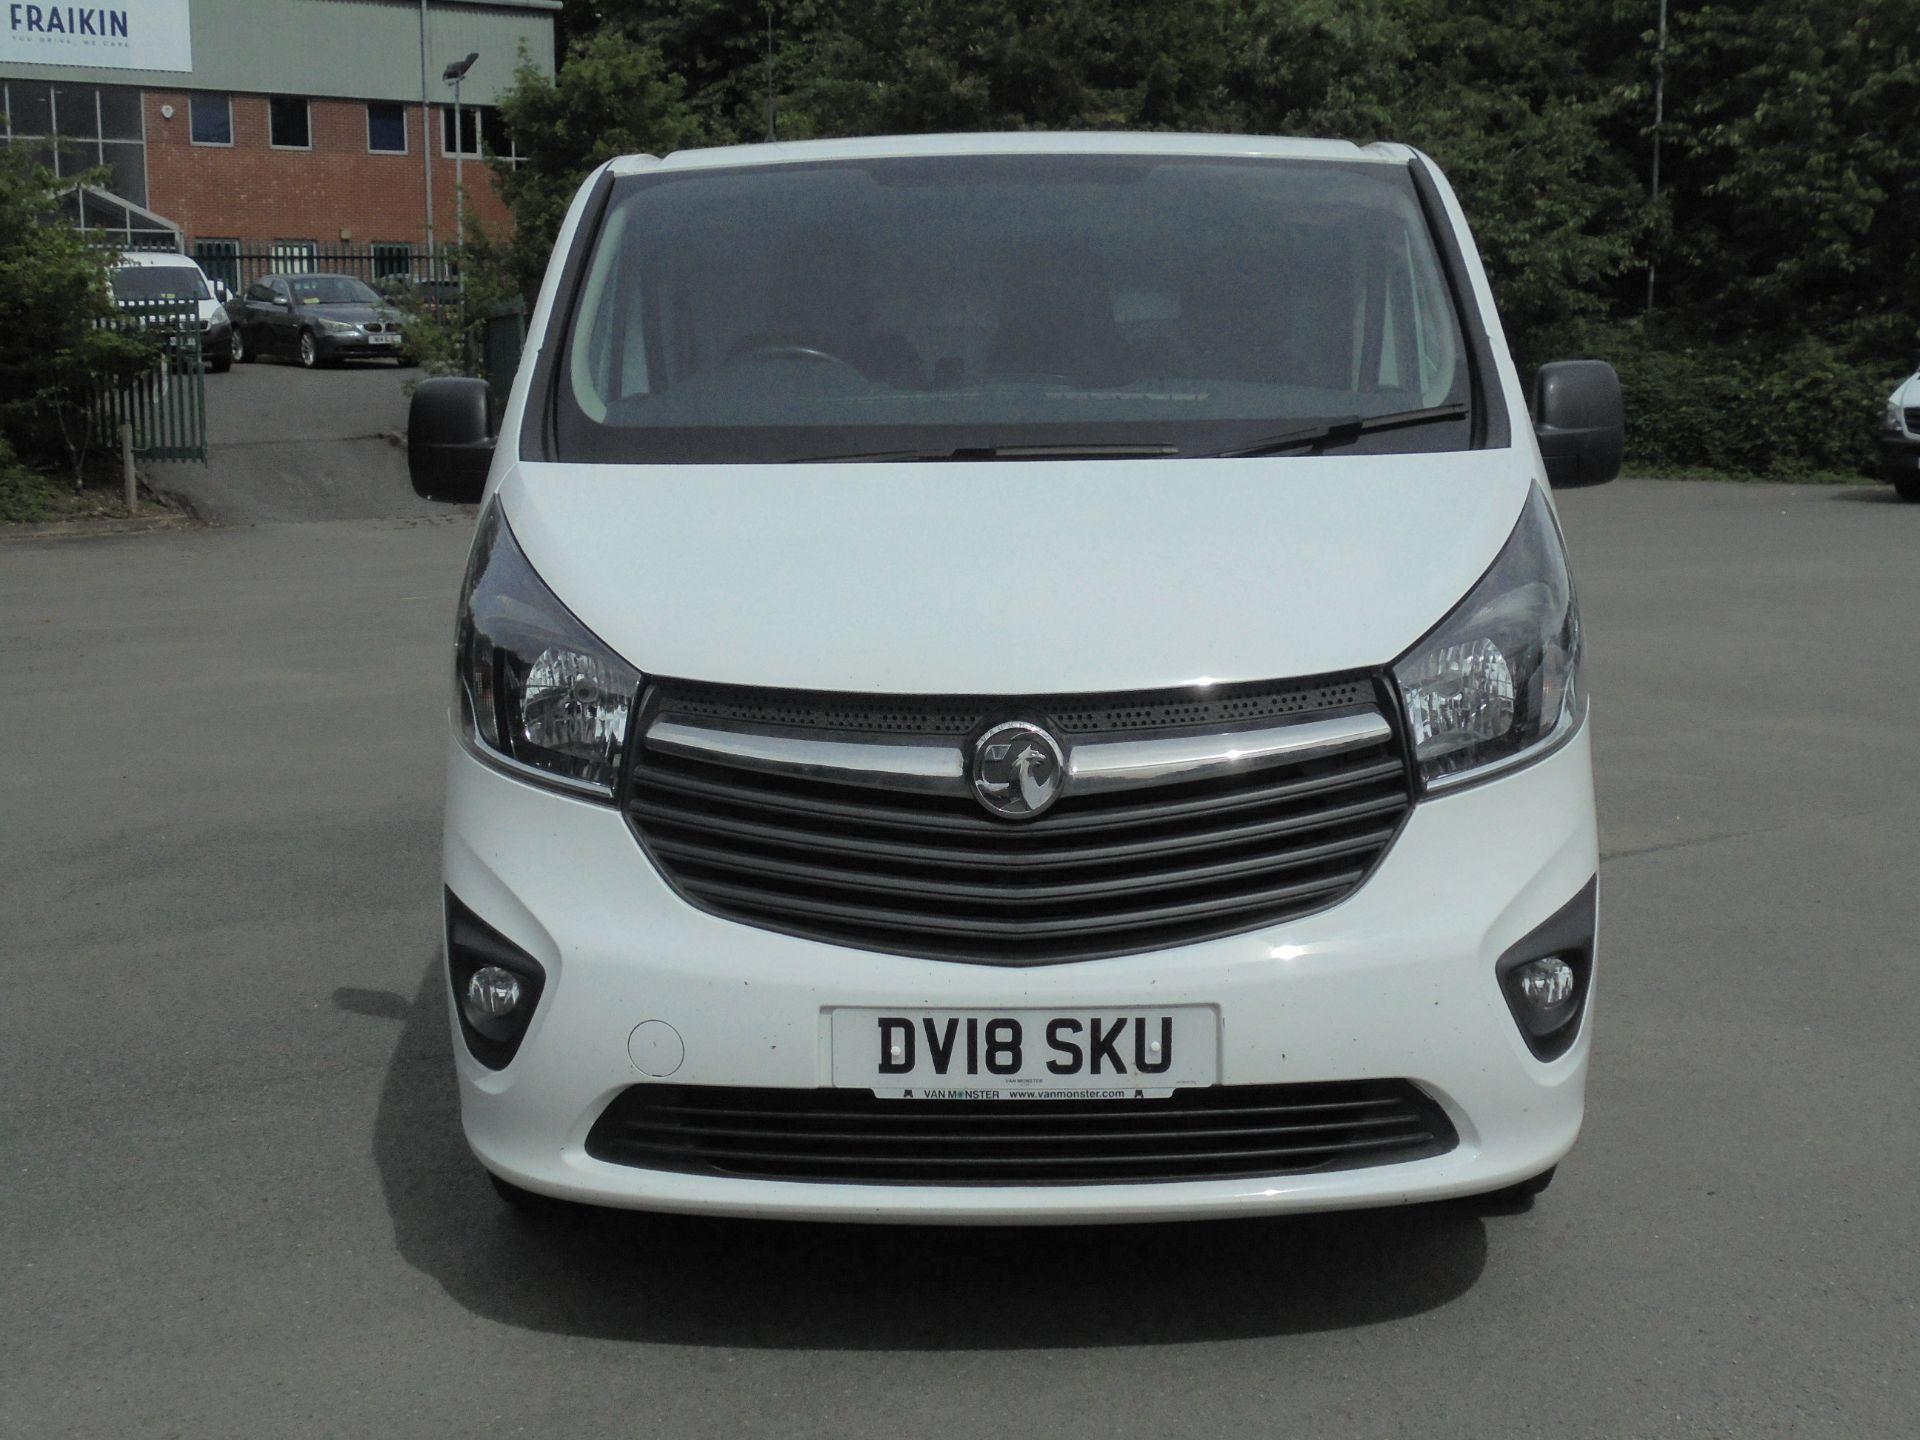 2018 Vauxhall Vivaro 2900 1.6Cdti 120Ps Sportive H1 Van (DV18SKU) Image 2